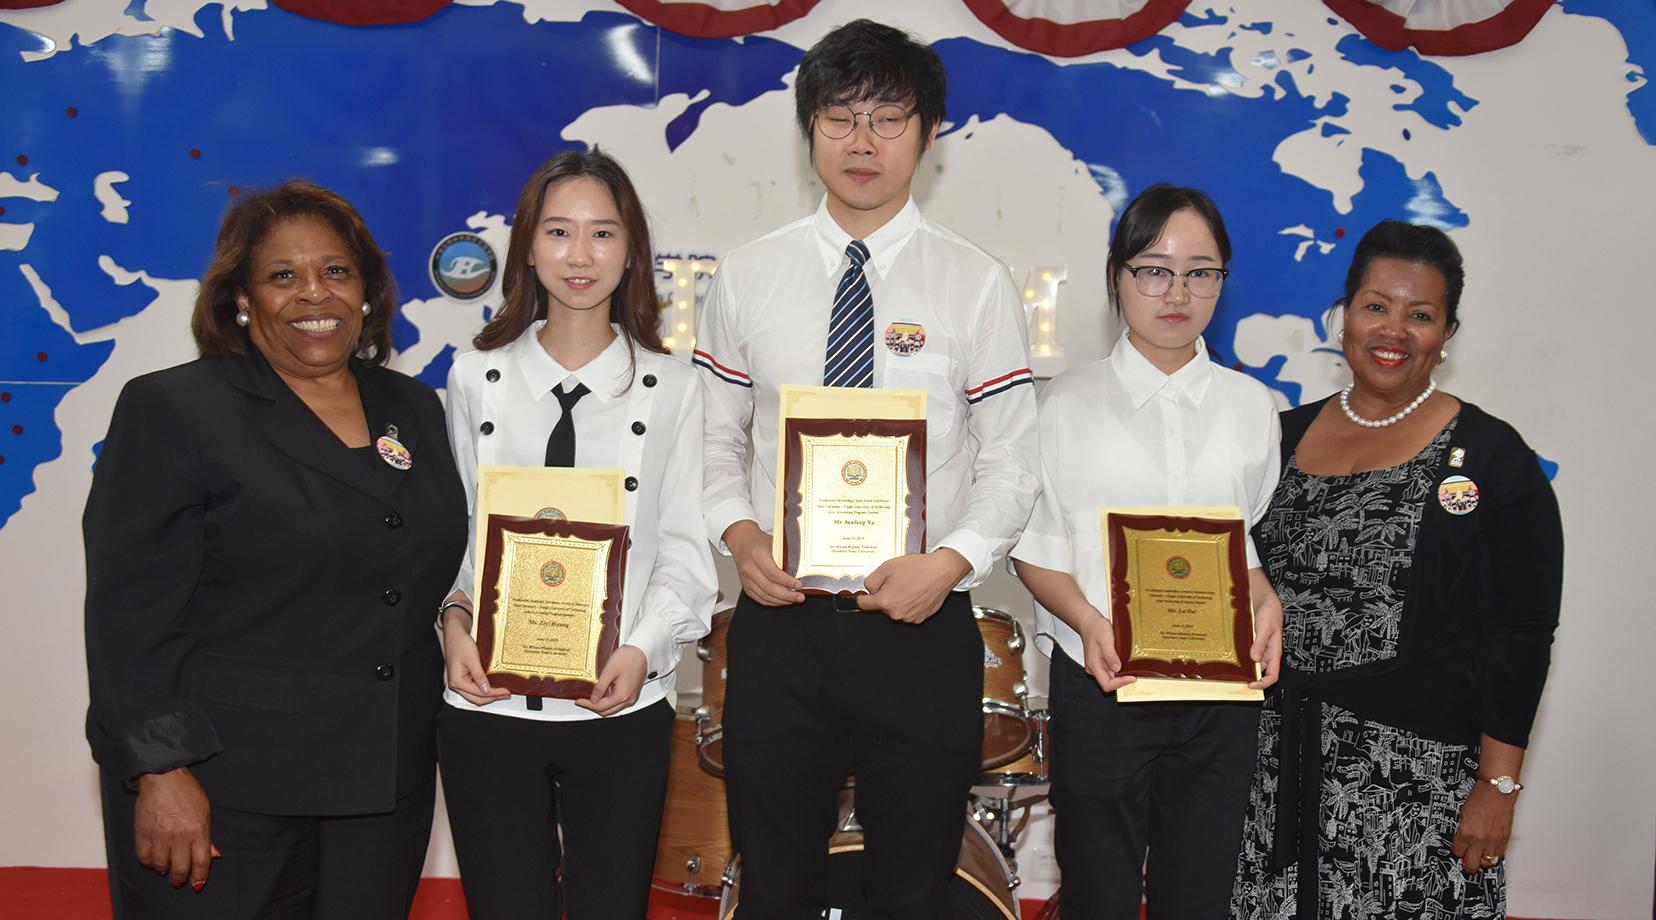 Joint Ningbo Univ. of Technology Accounting graduates celebrated